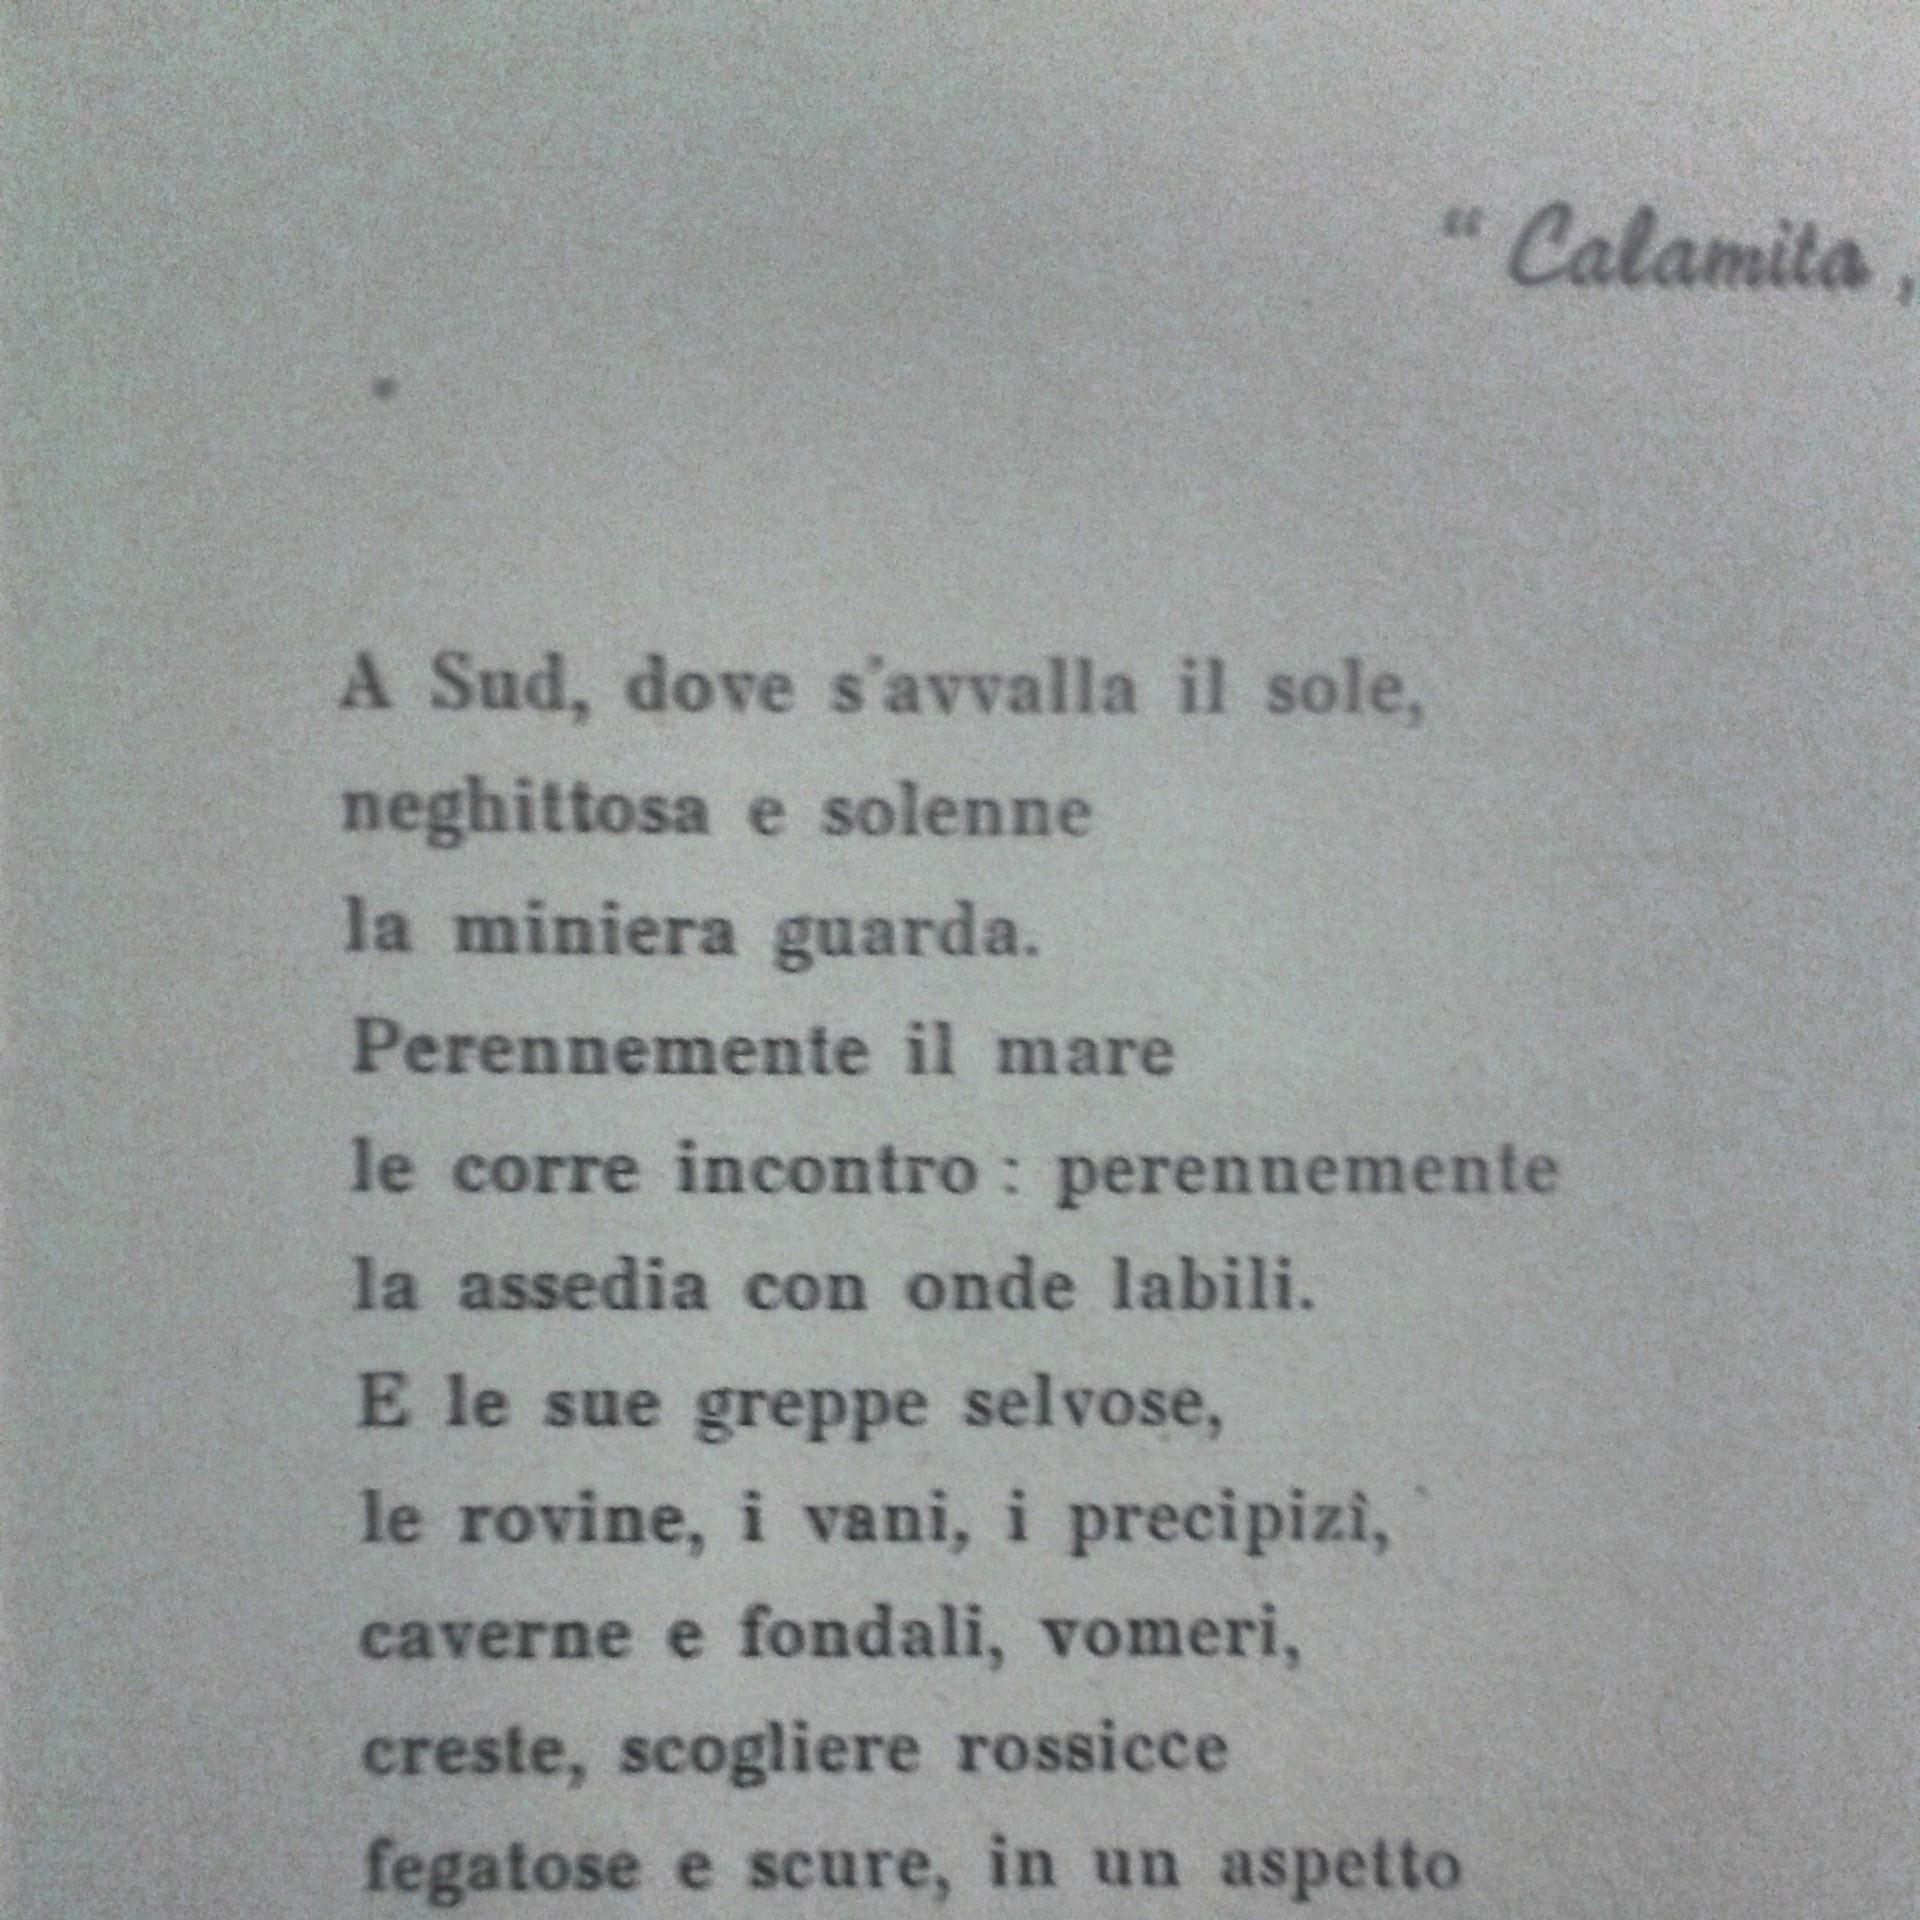 Calamita (Foto Nicola Carraresi)